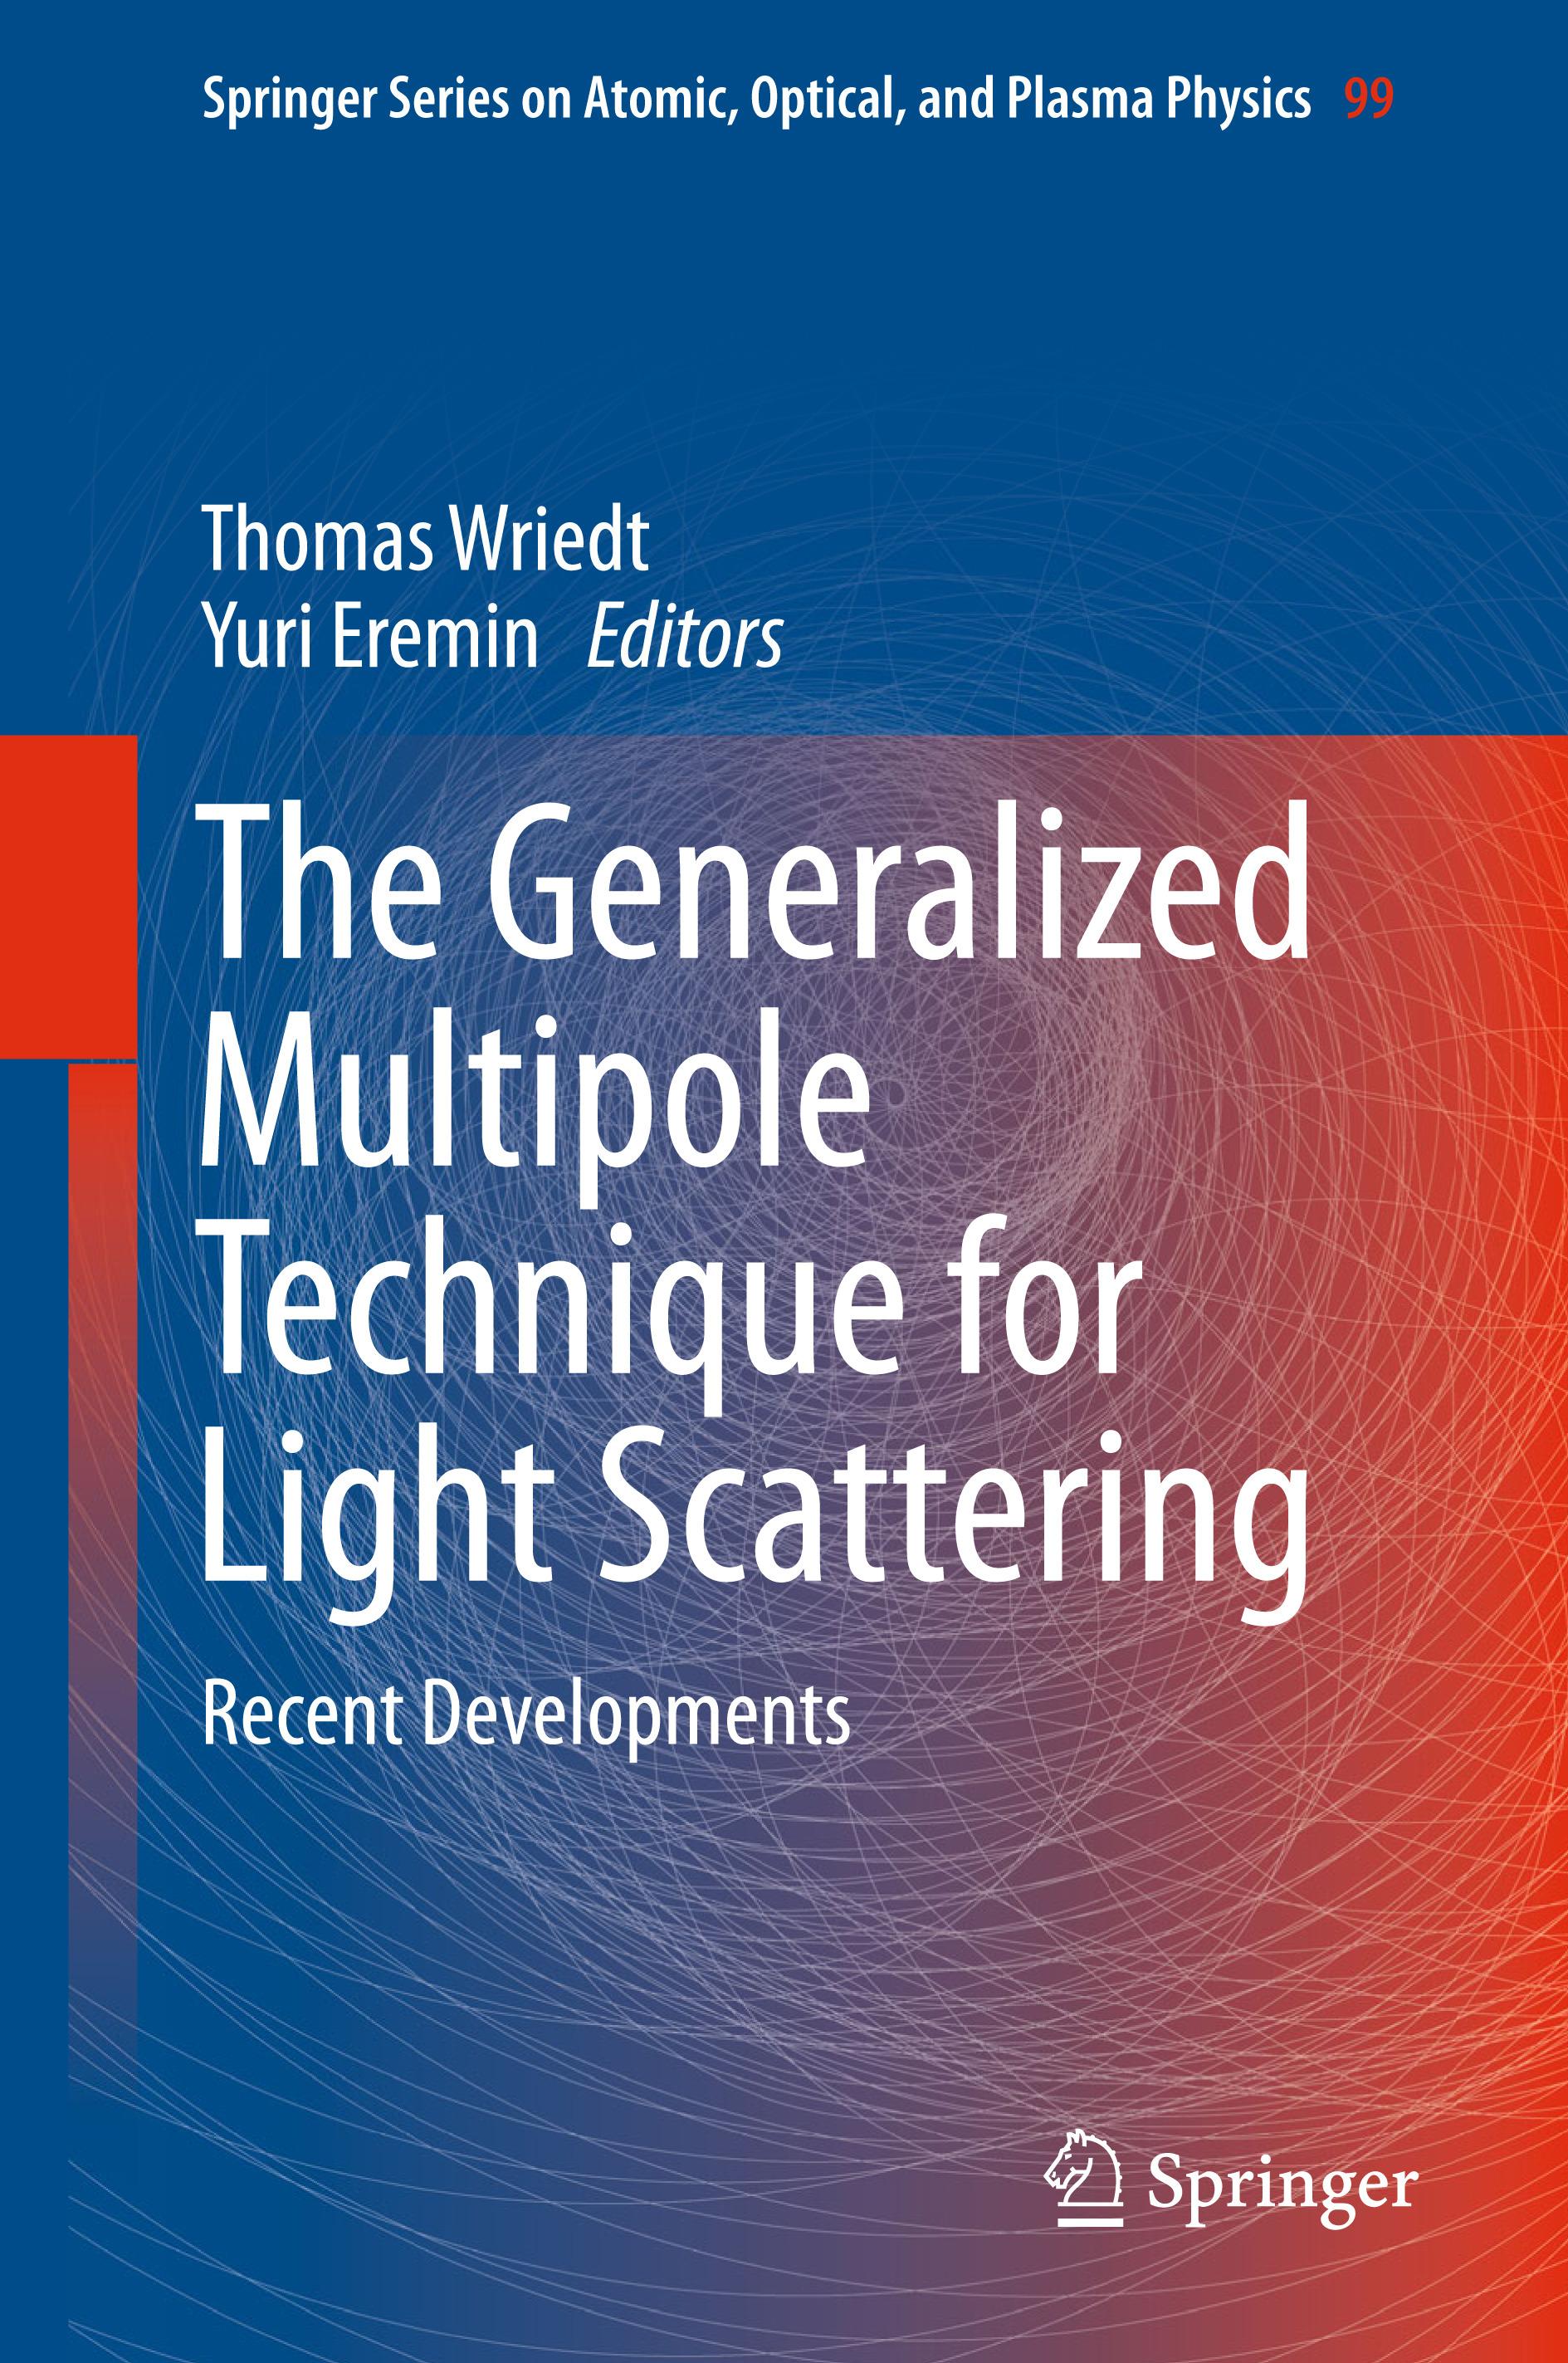 Eremin, Yuri - The Generalized Multipole Technique for Light Scattering, ebook